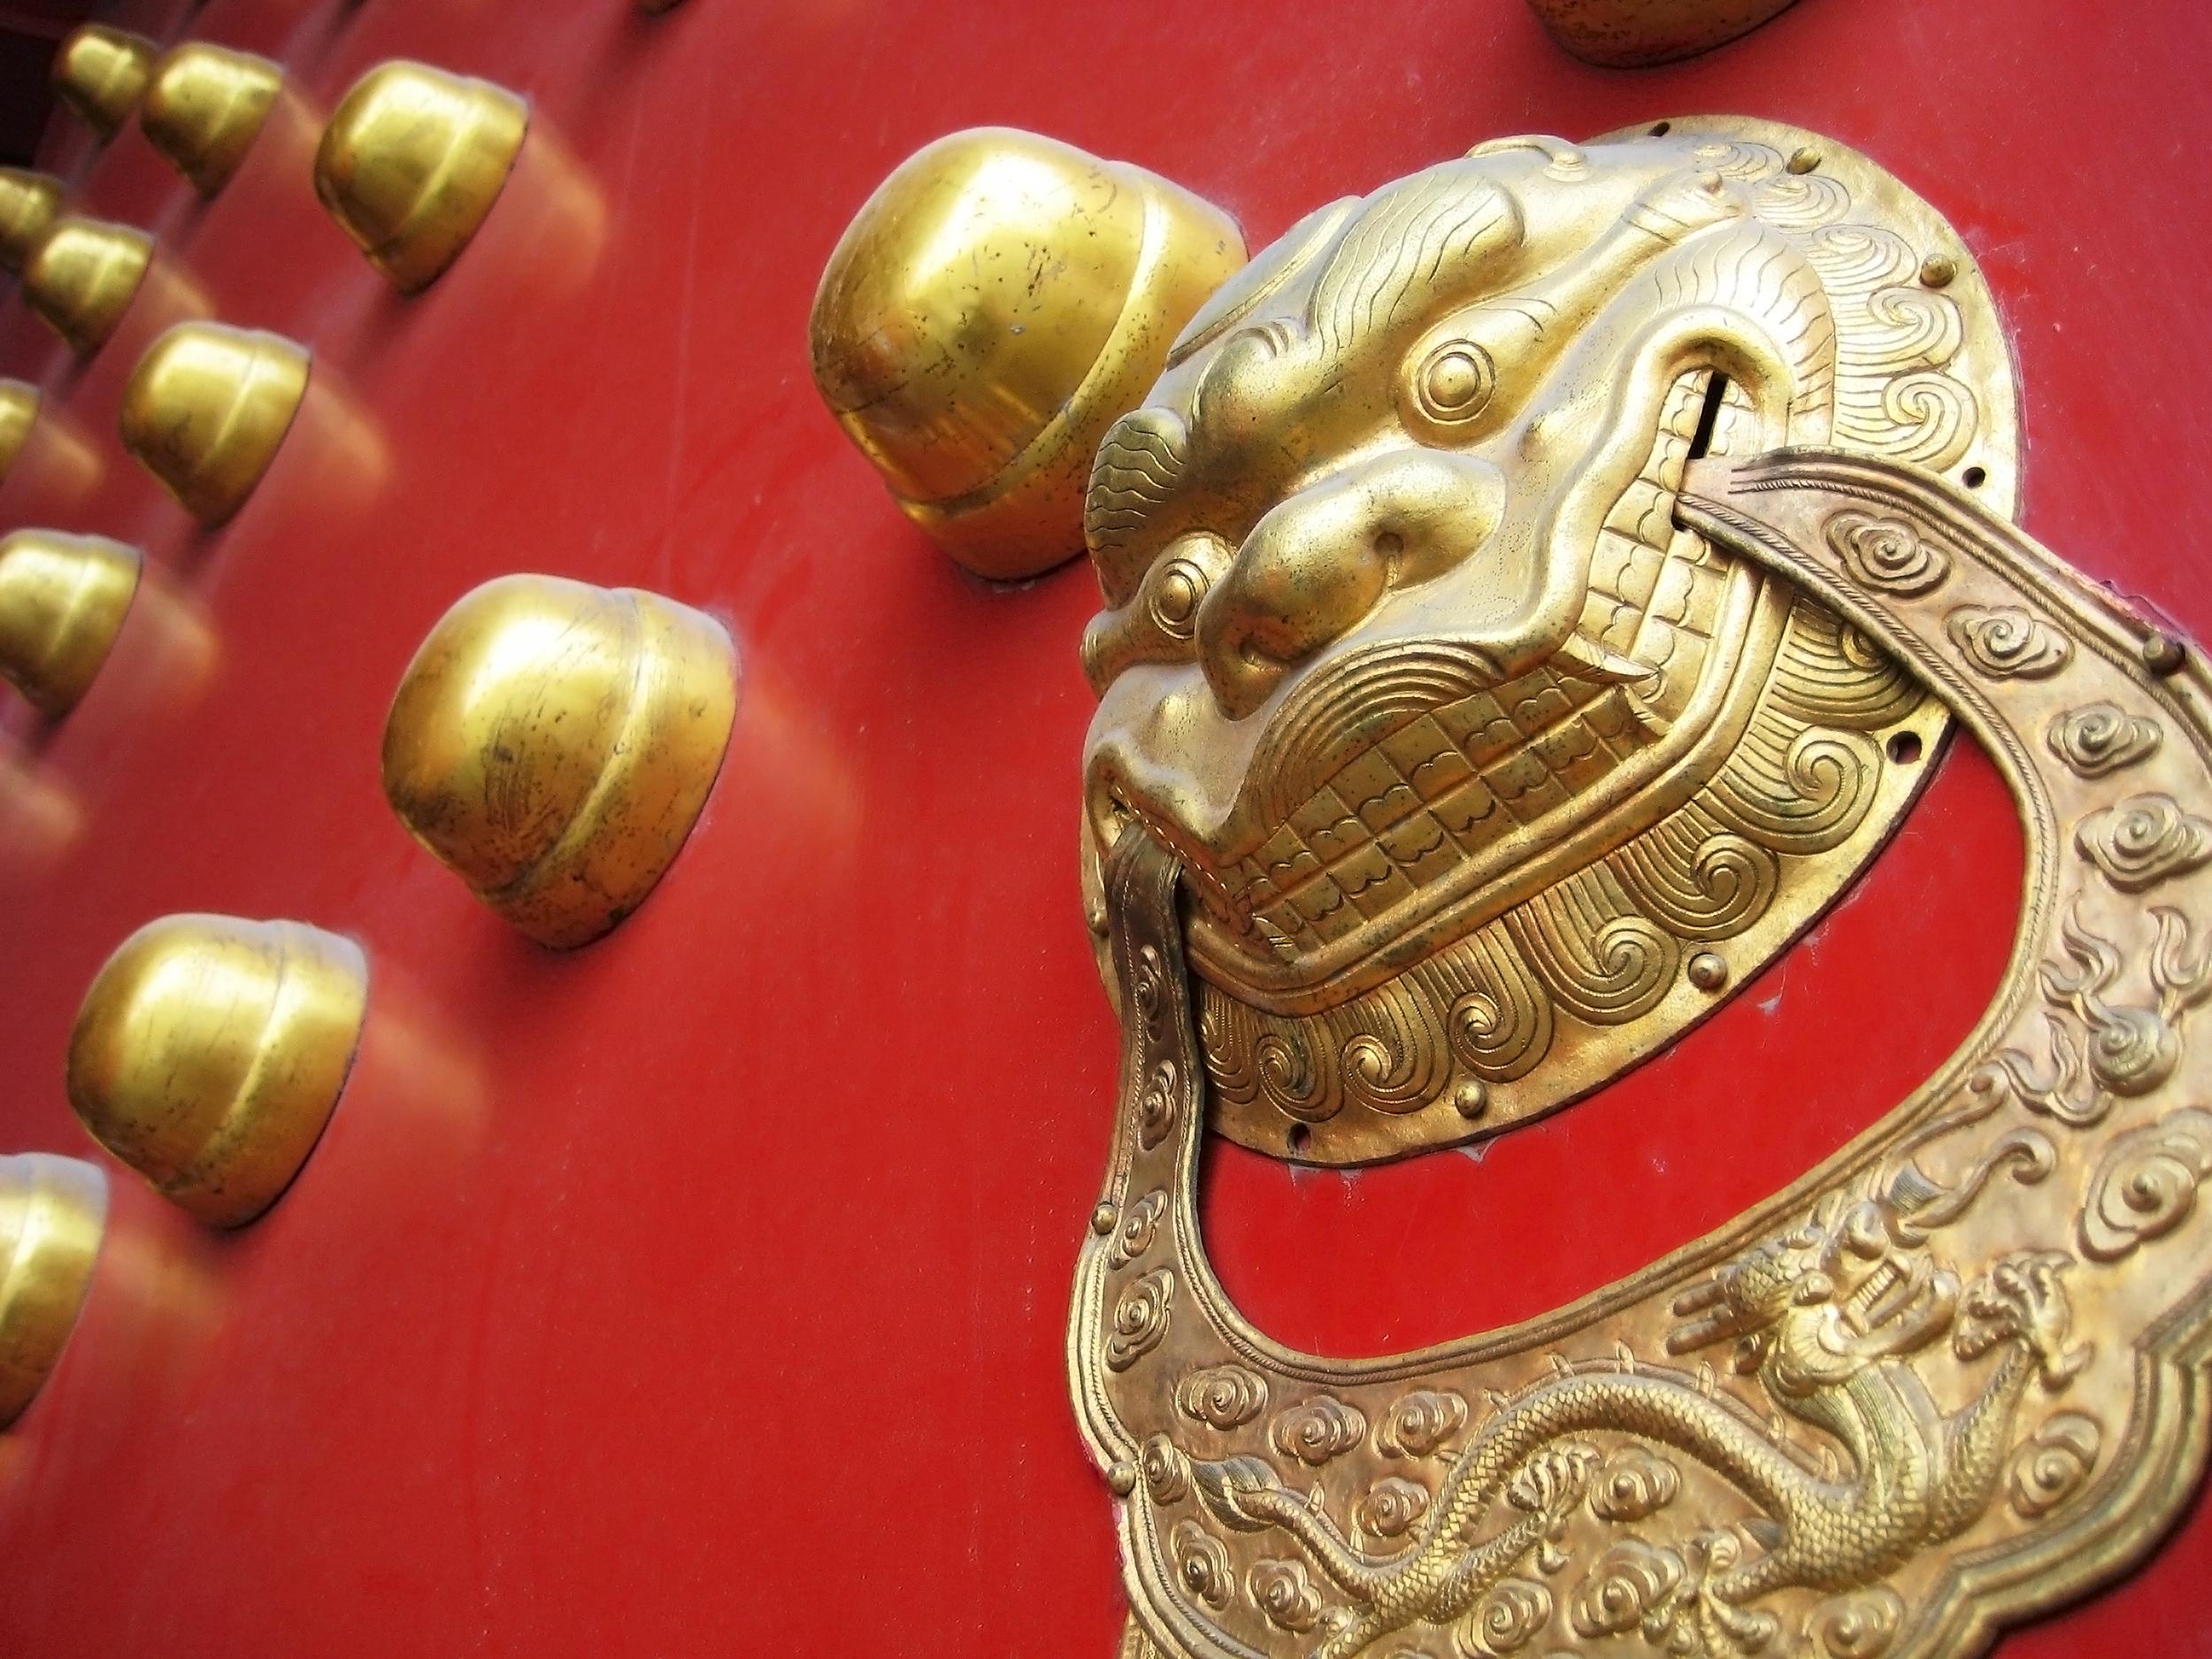 Six ways to crack China